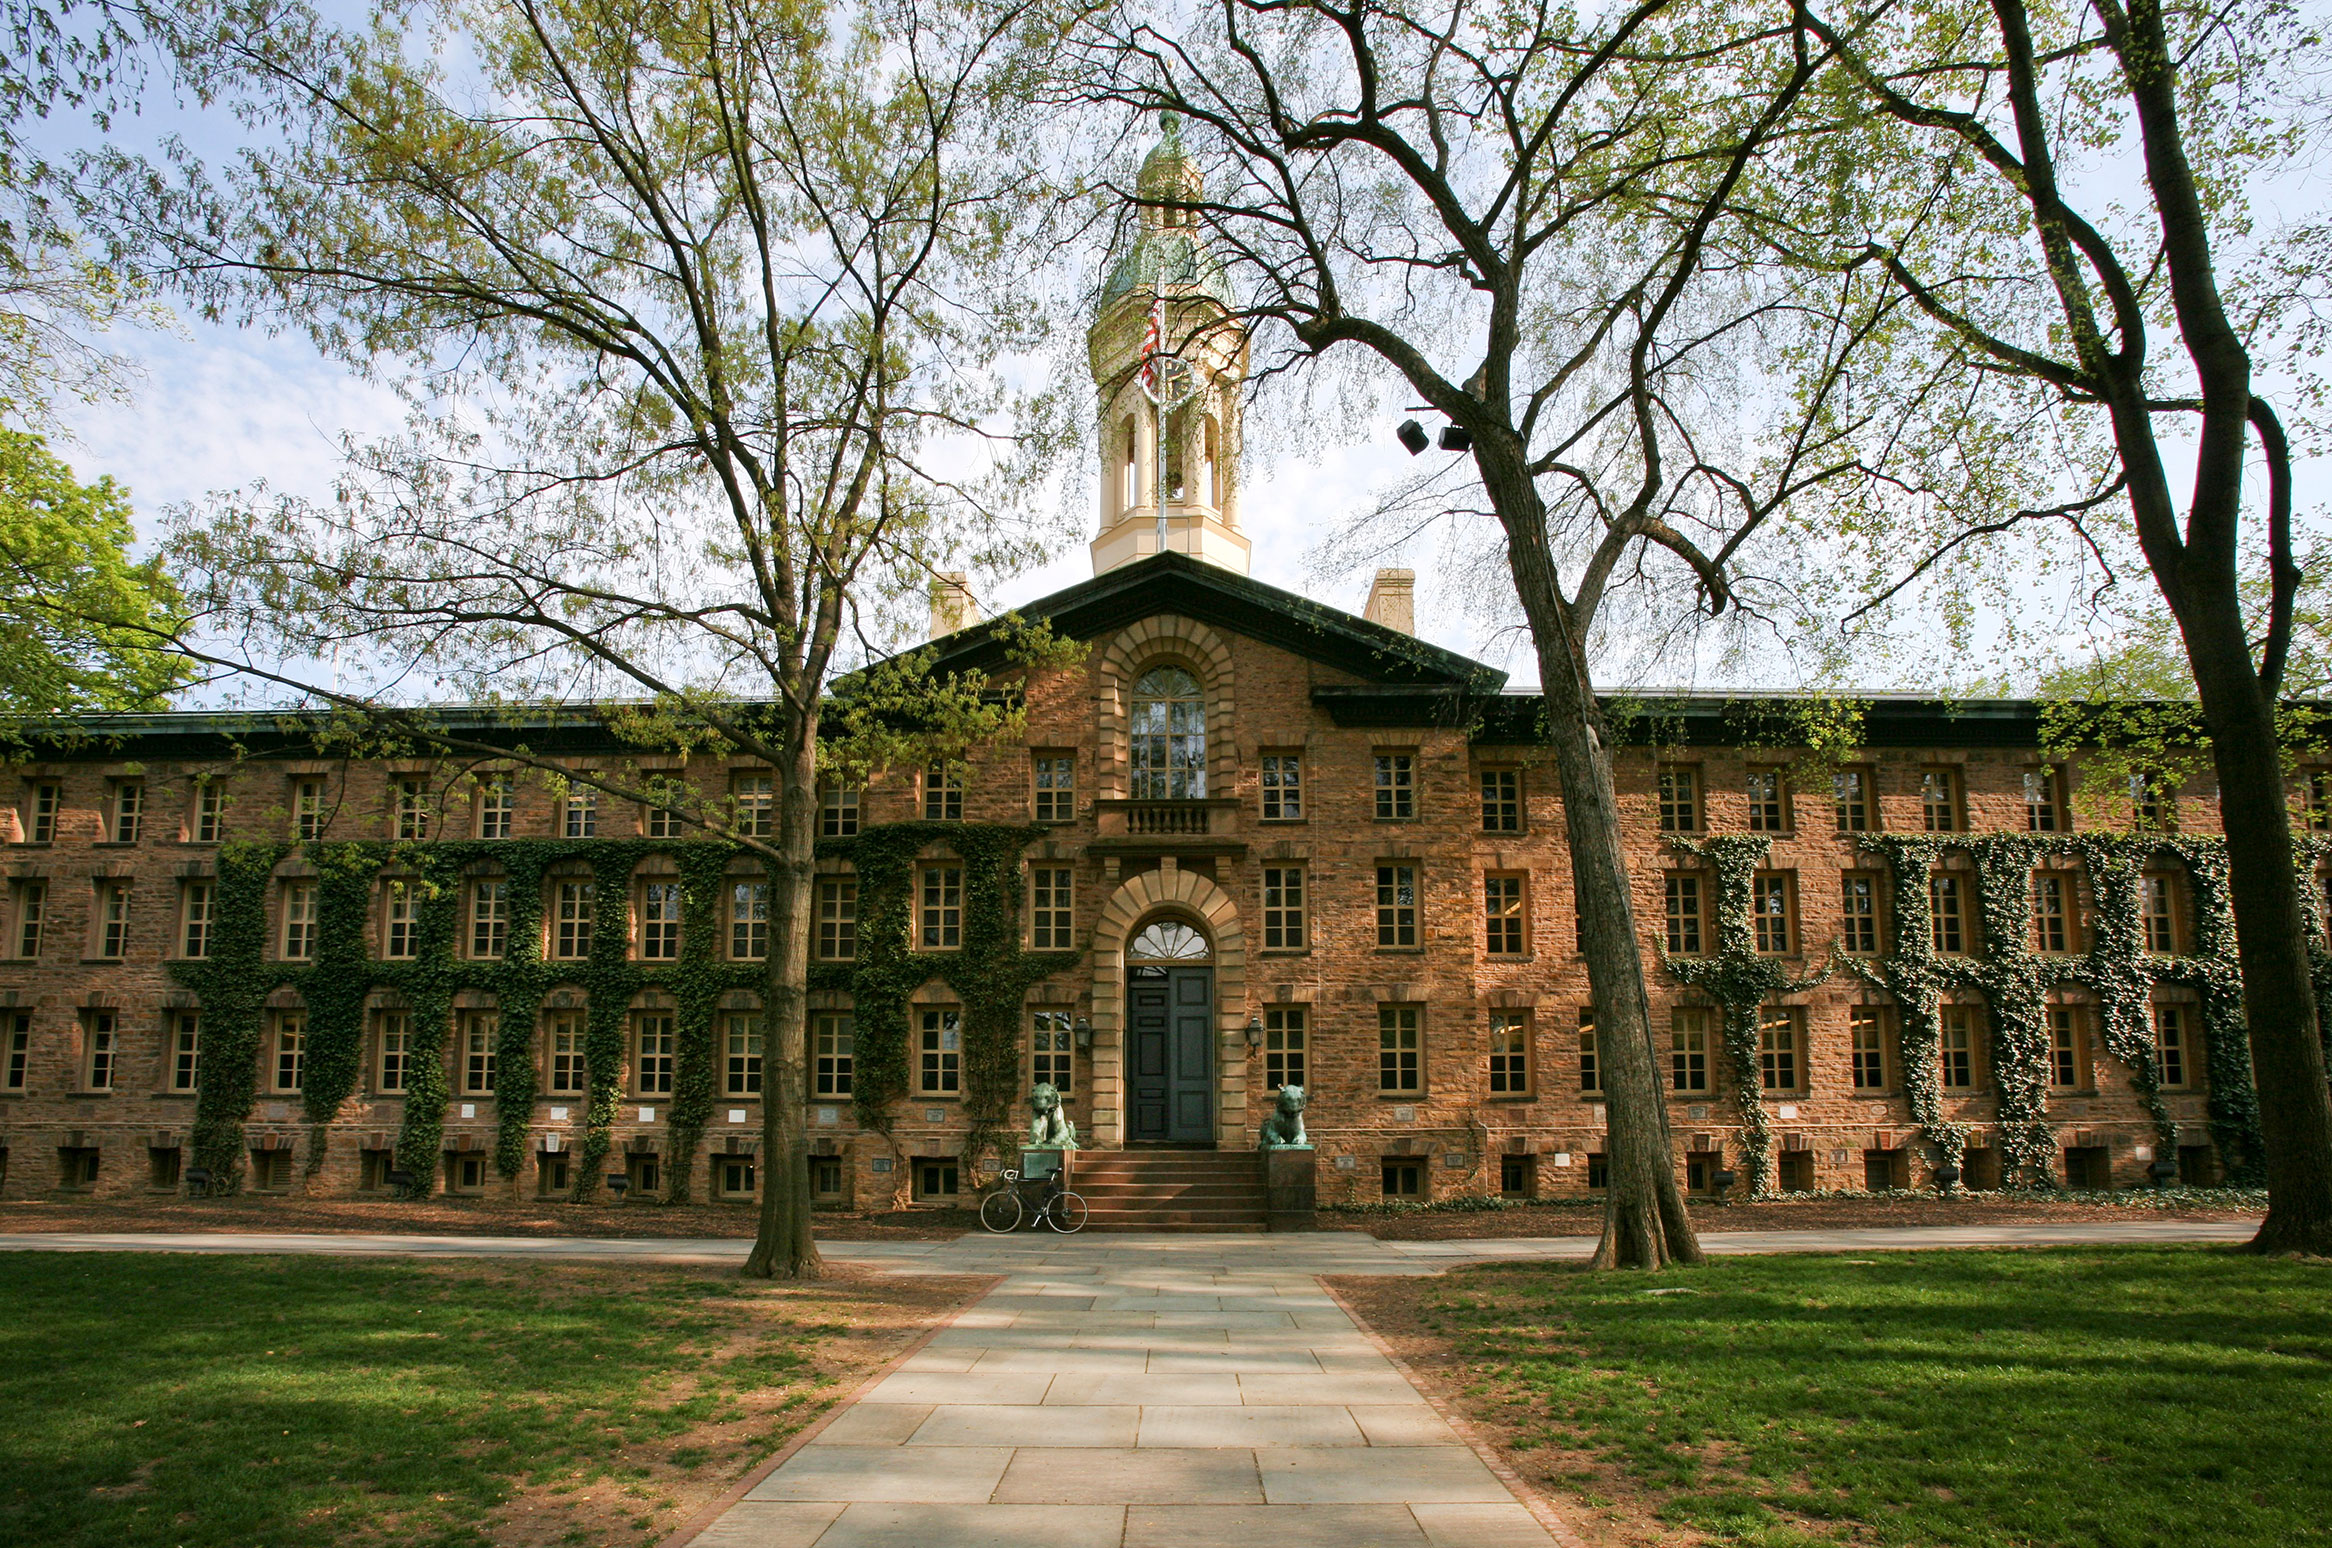 Top 110 Best Colleges in America: Public, Private & Community Institutions